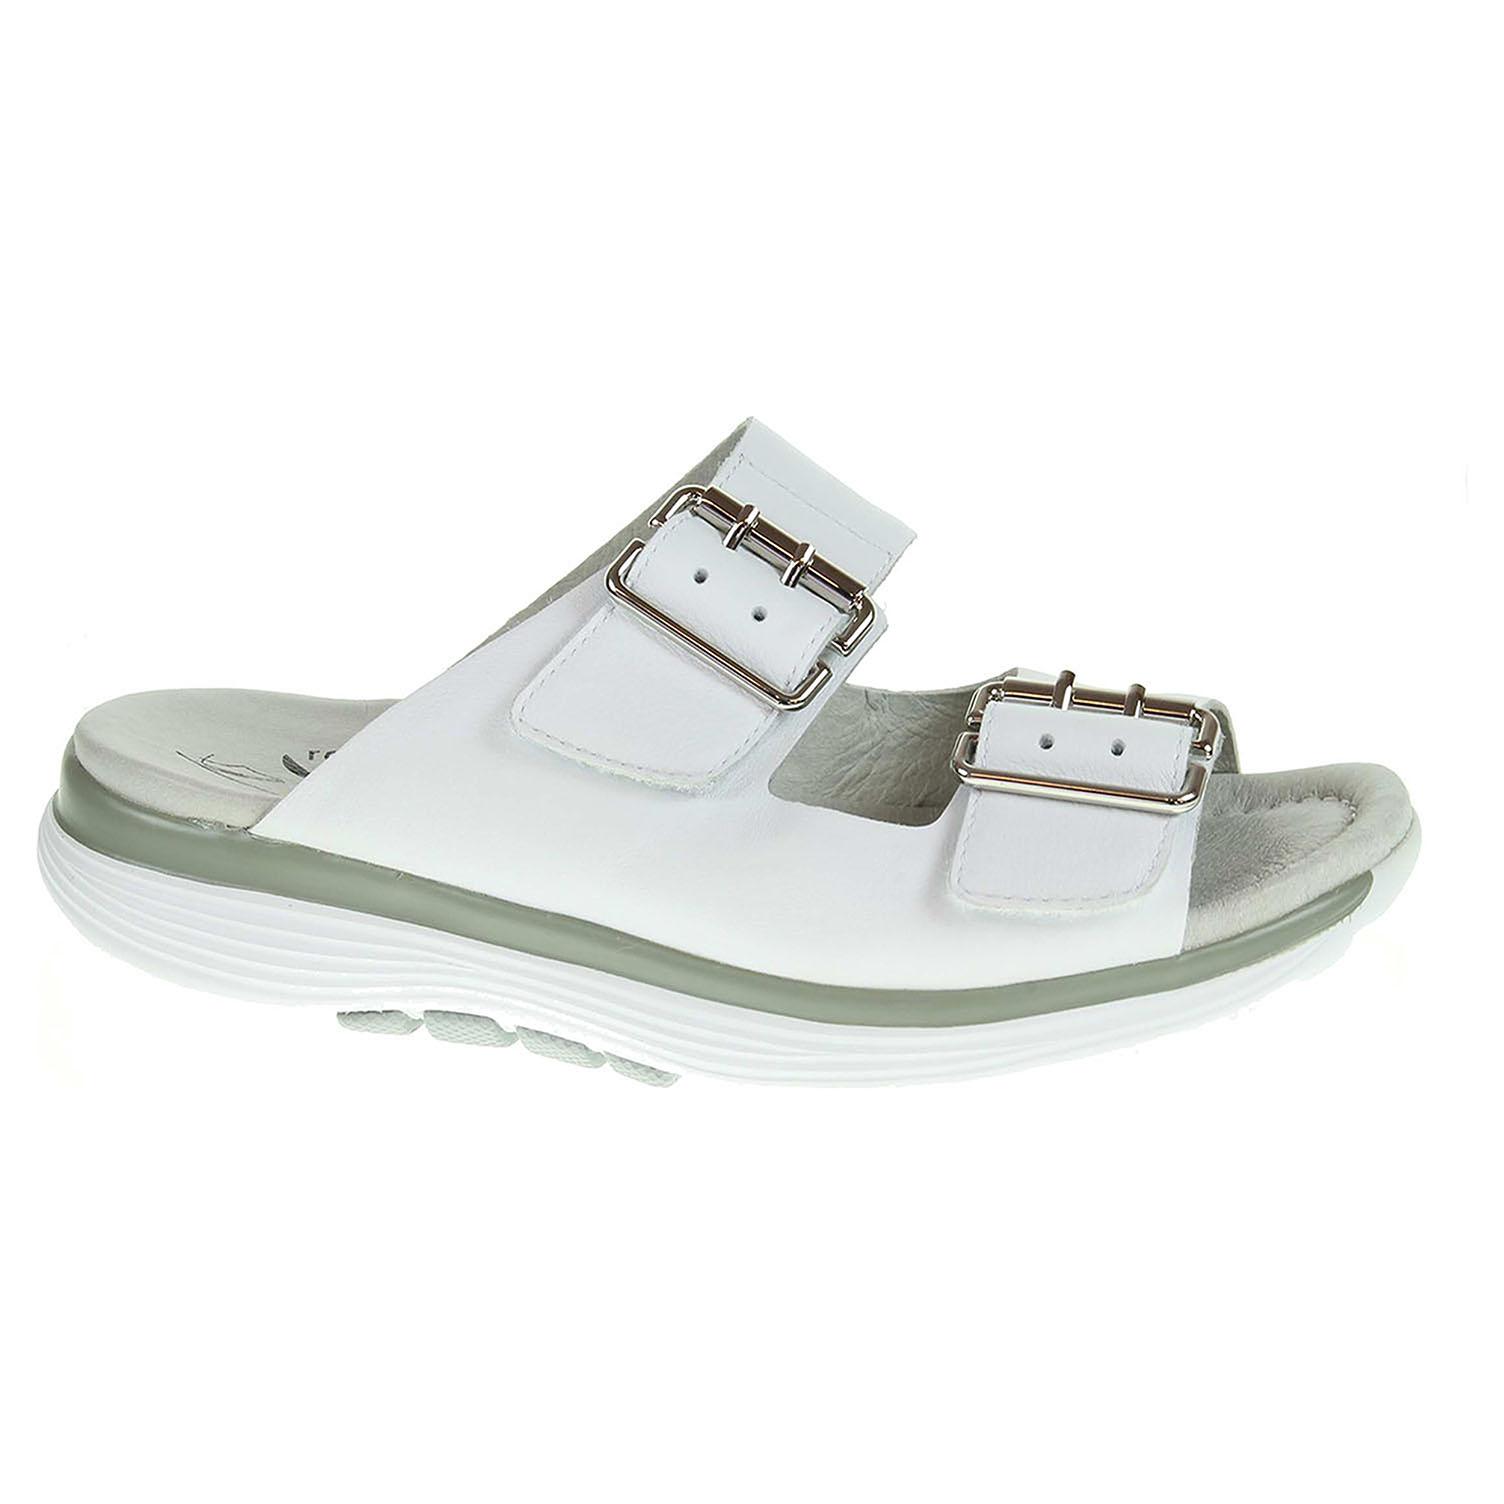 Dámské pantofle Gabor 66.910.50 bílé 66.910.50 38